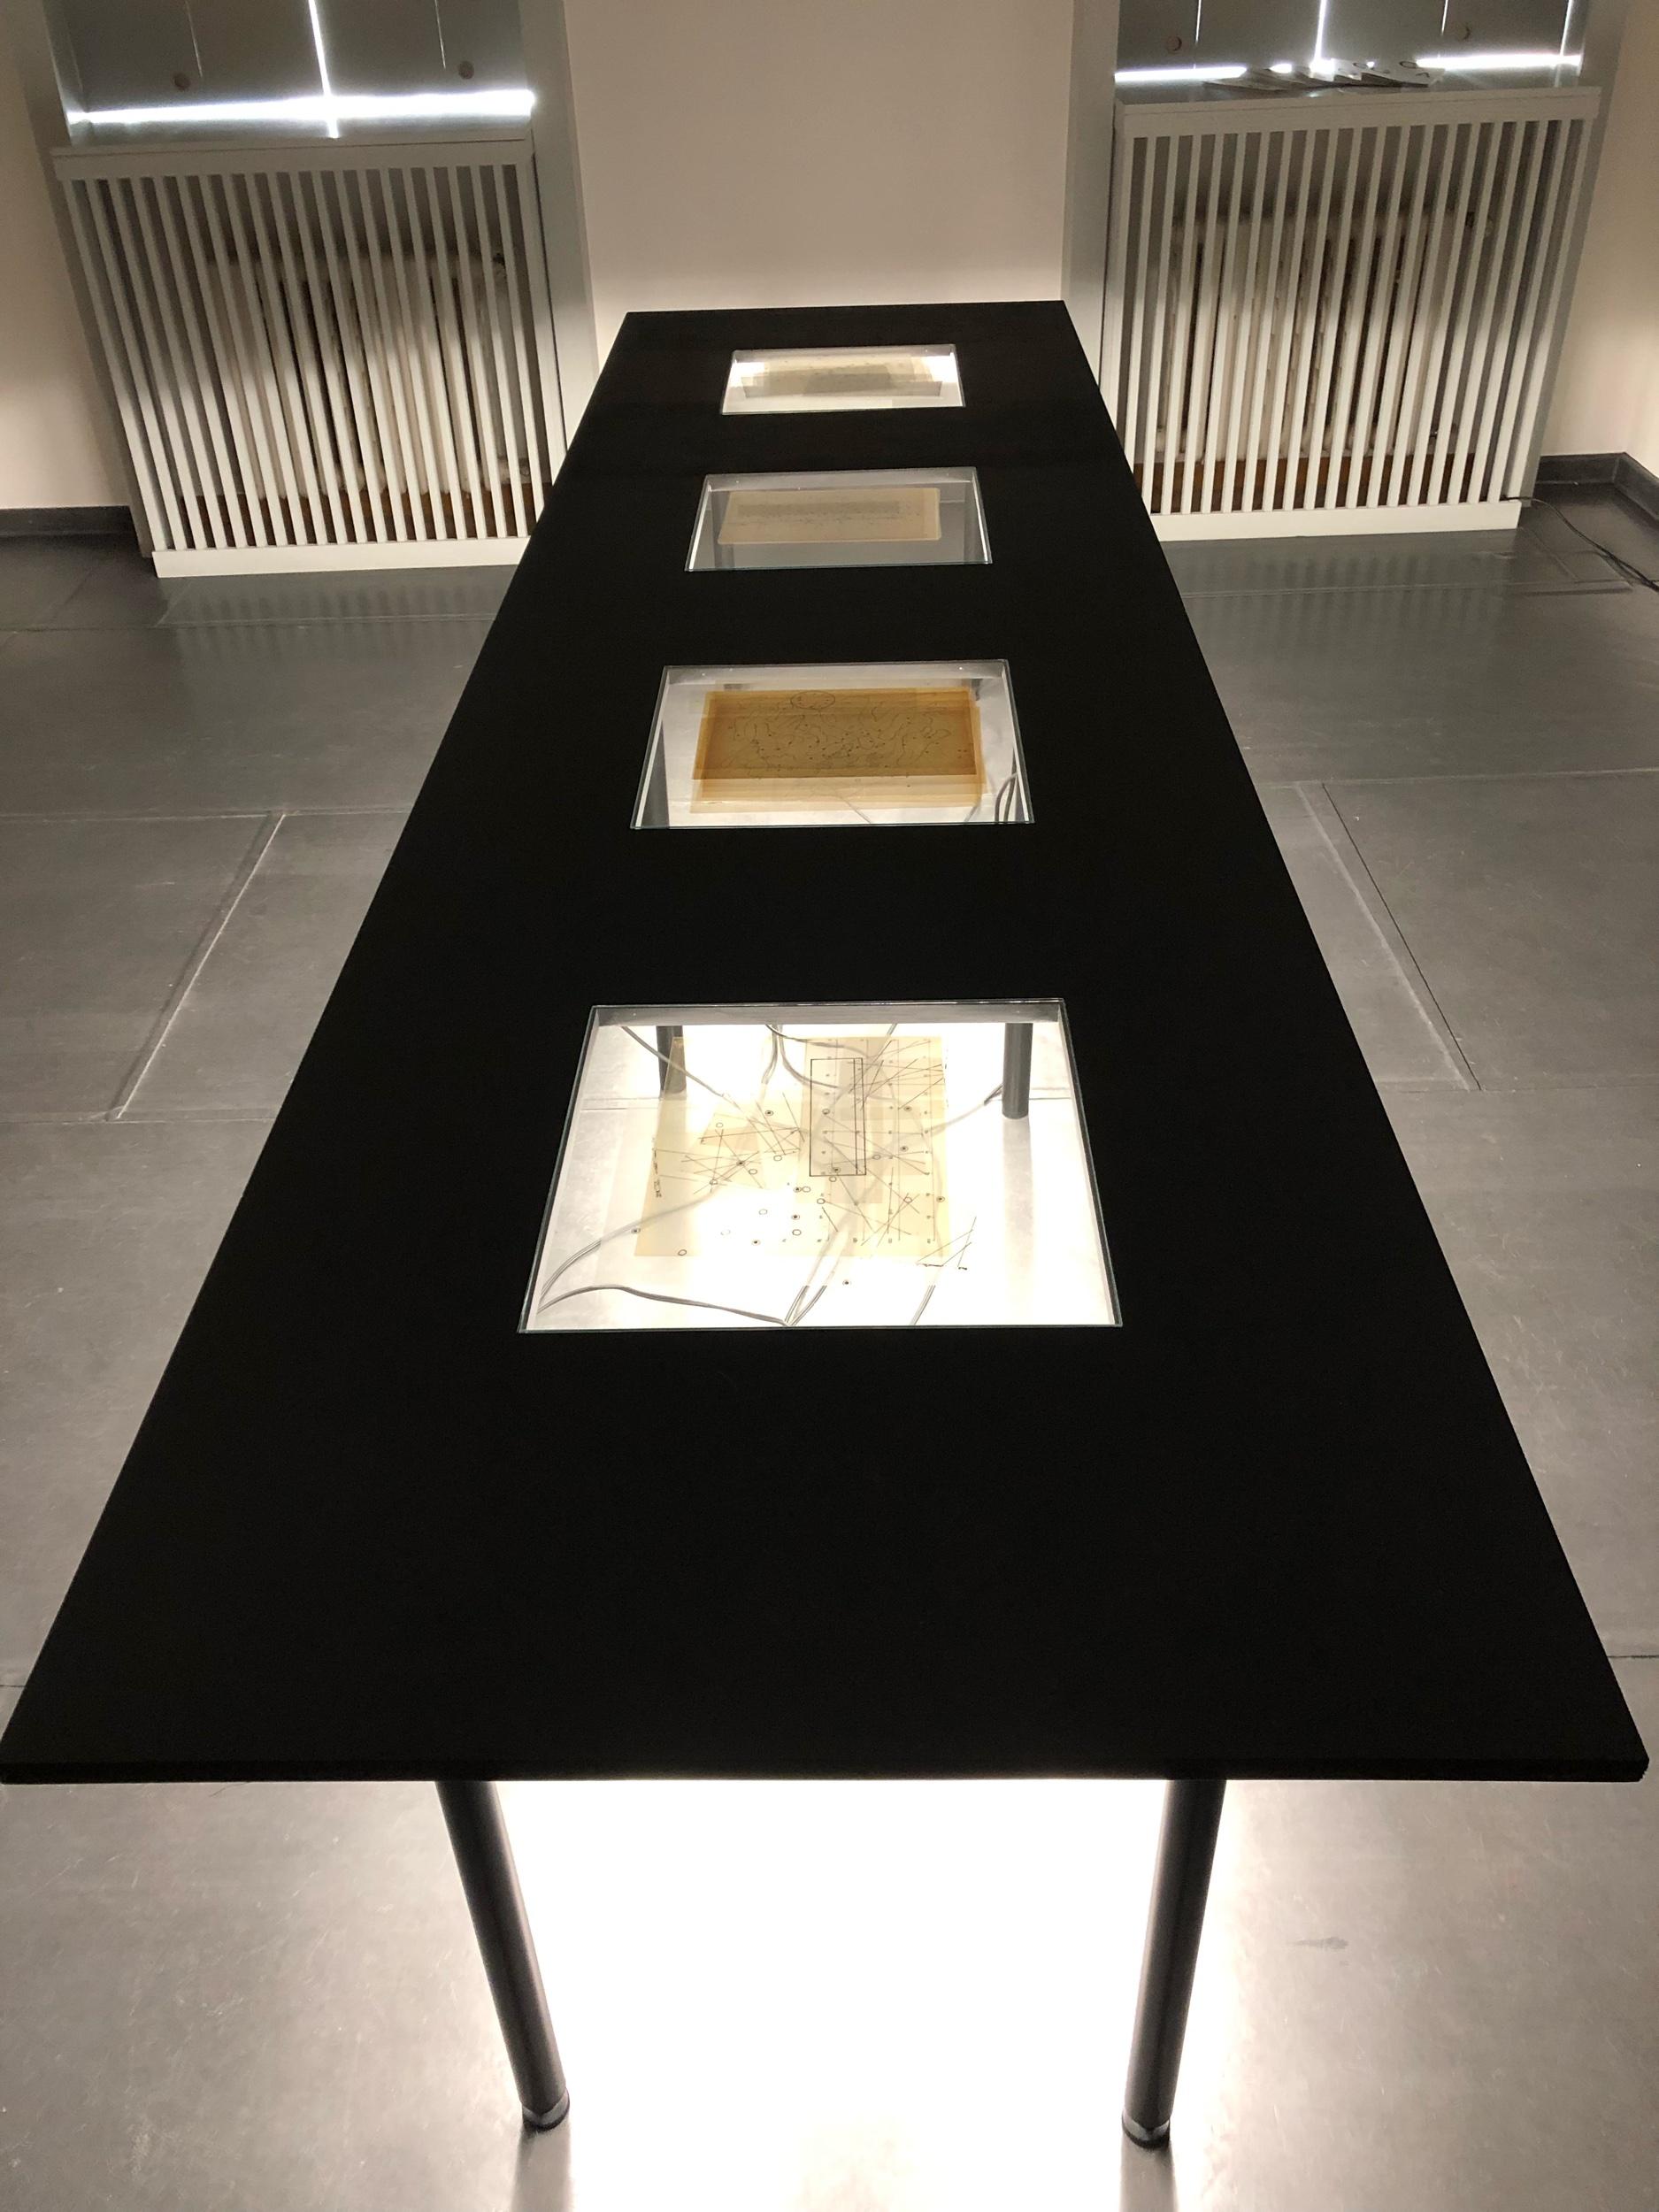 John Cage, foto z výstavy